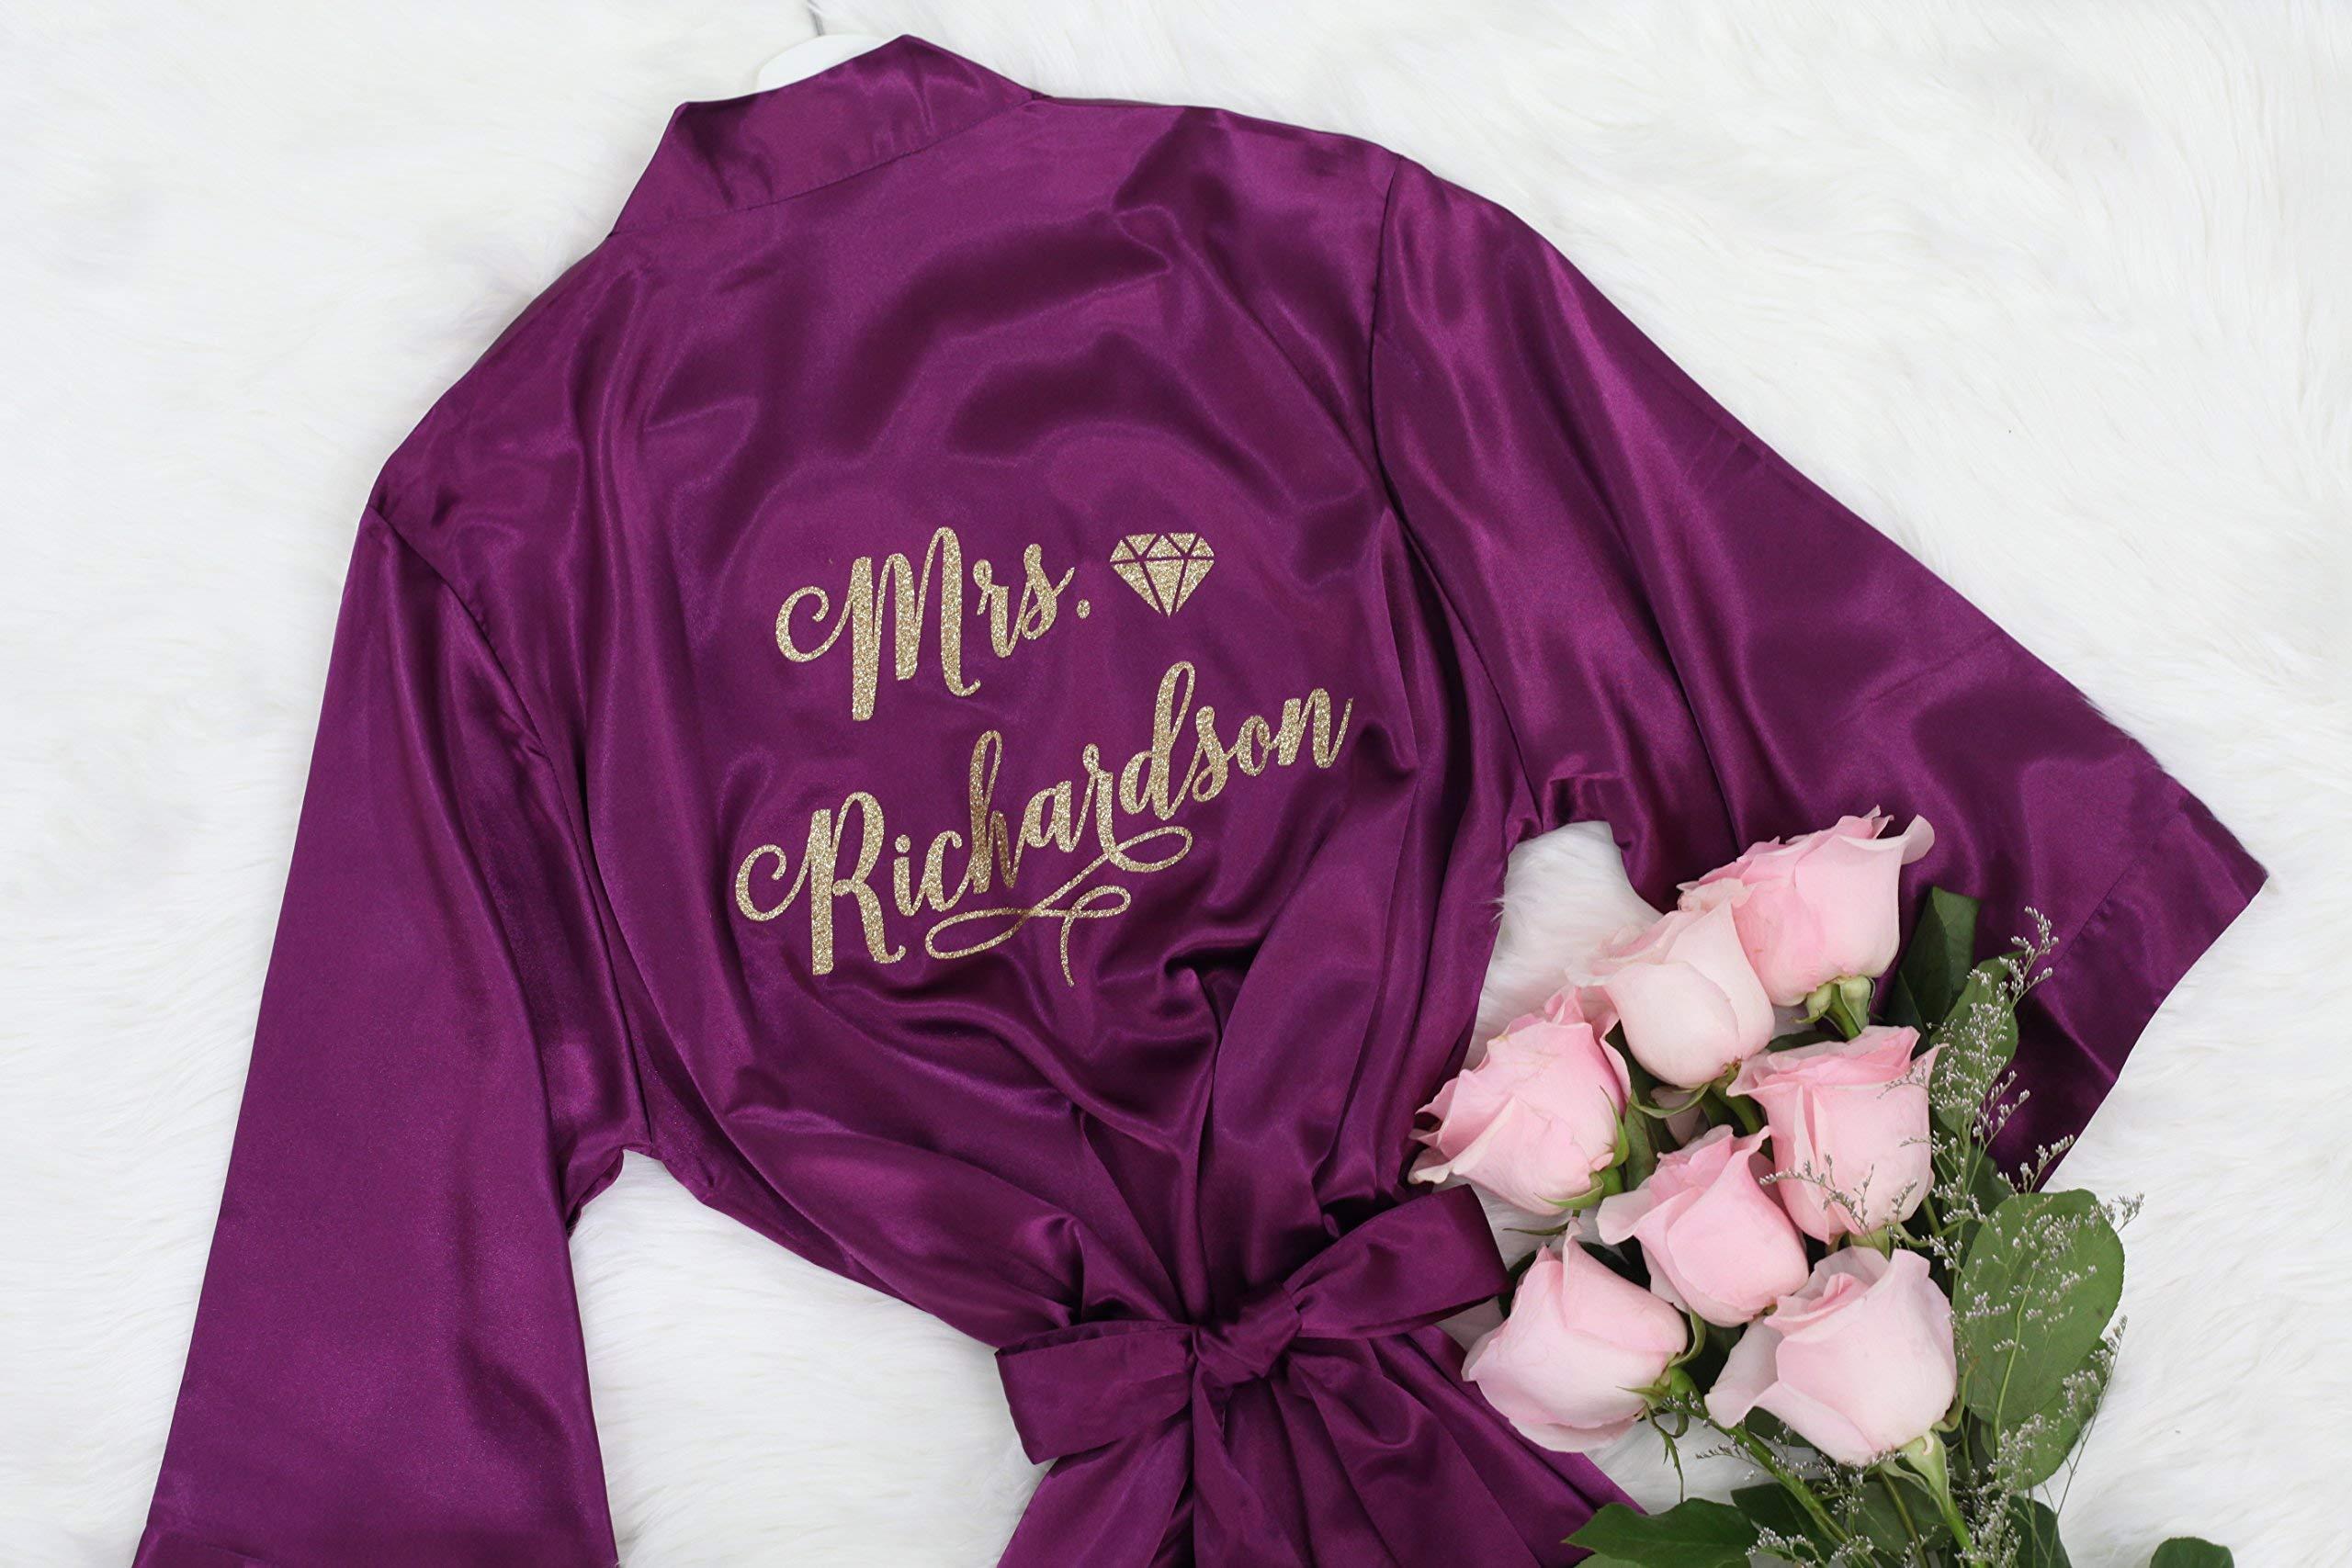 Joy Mabelle Women's Solid Silk Satin Short Kimono Robes Nightwear Bridesmaids Customized Name Lavender Robe For Women